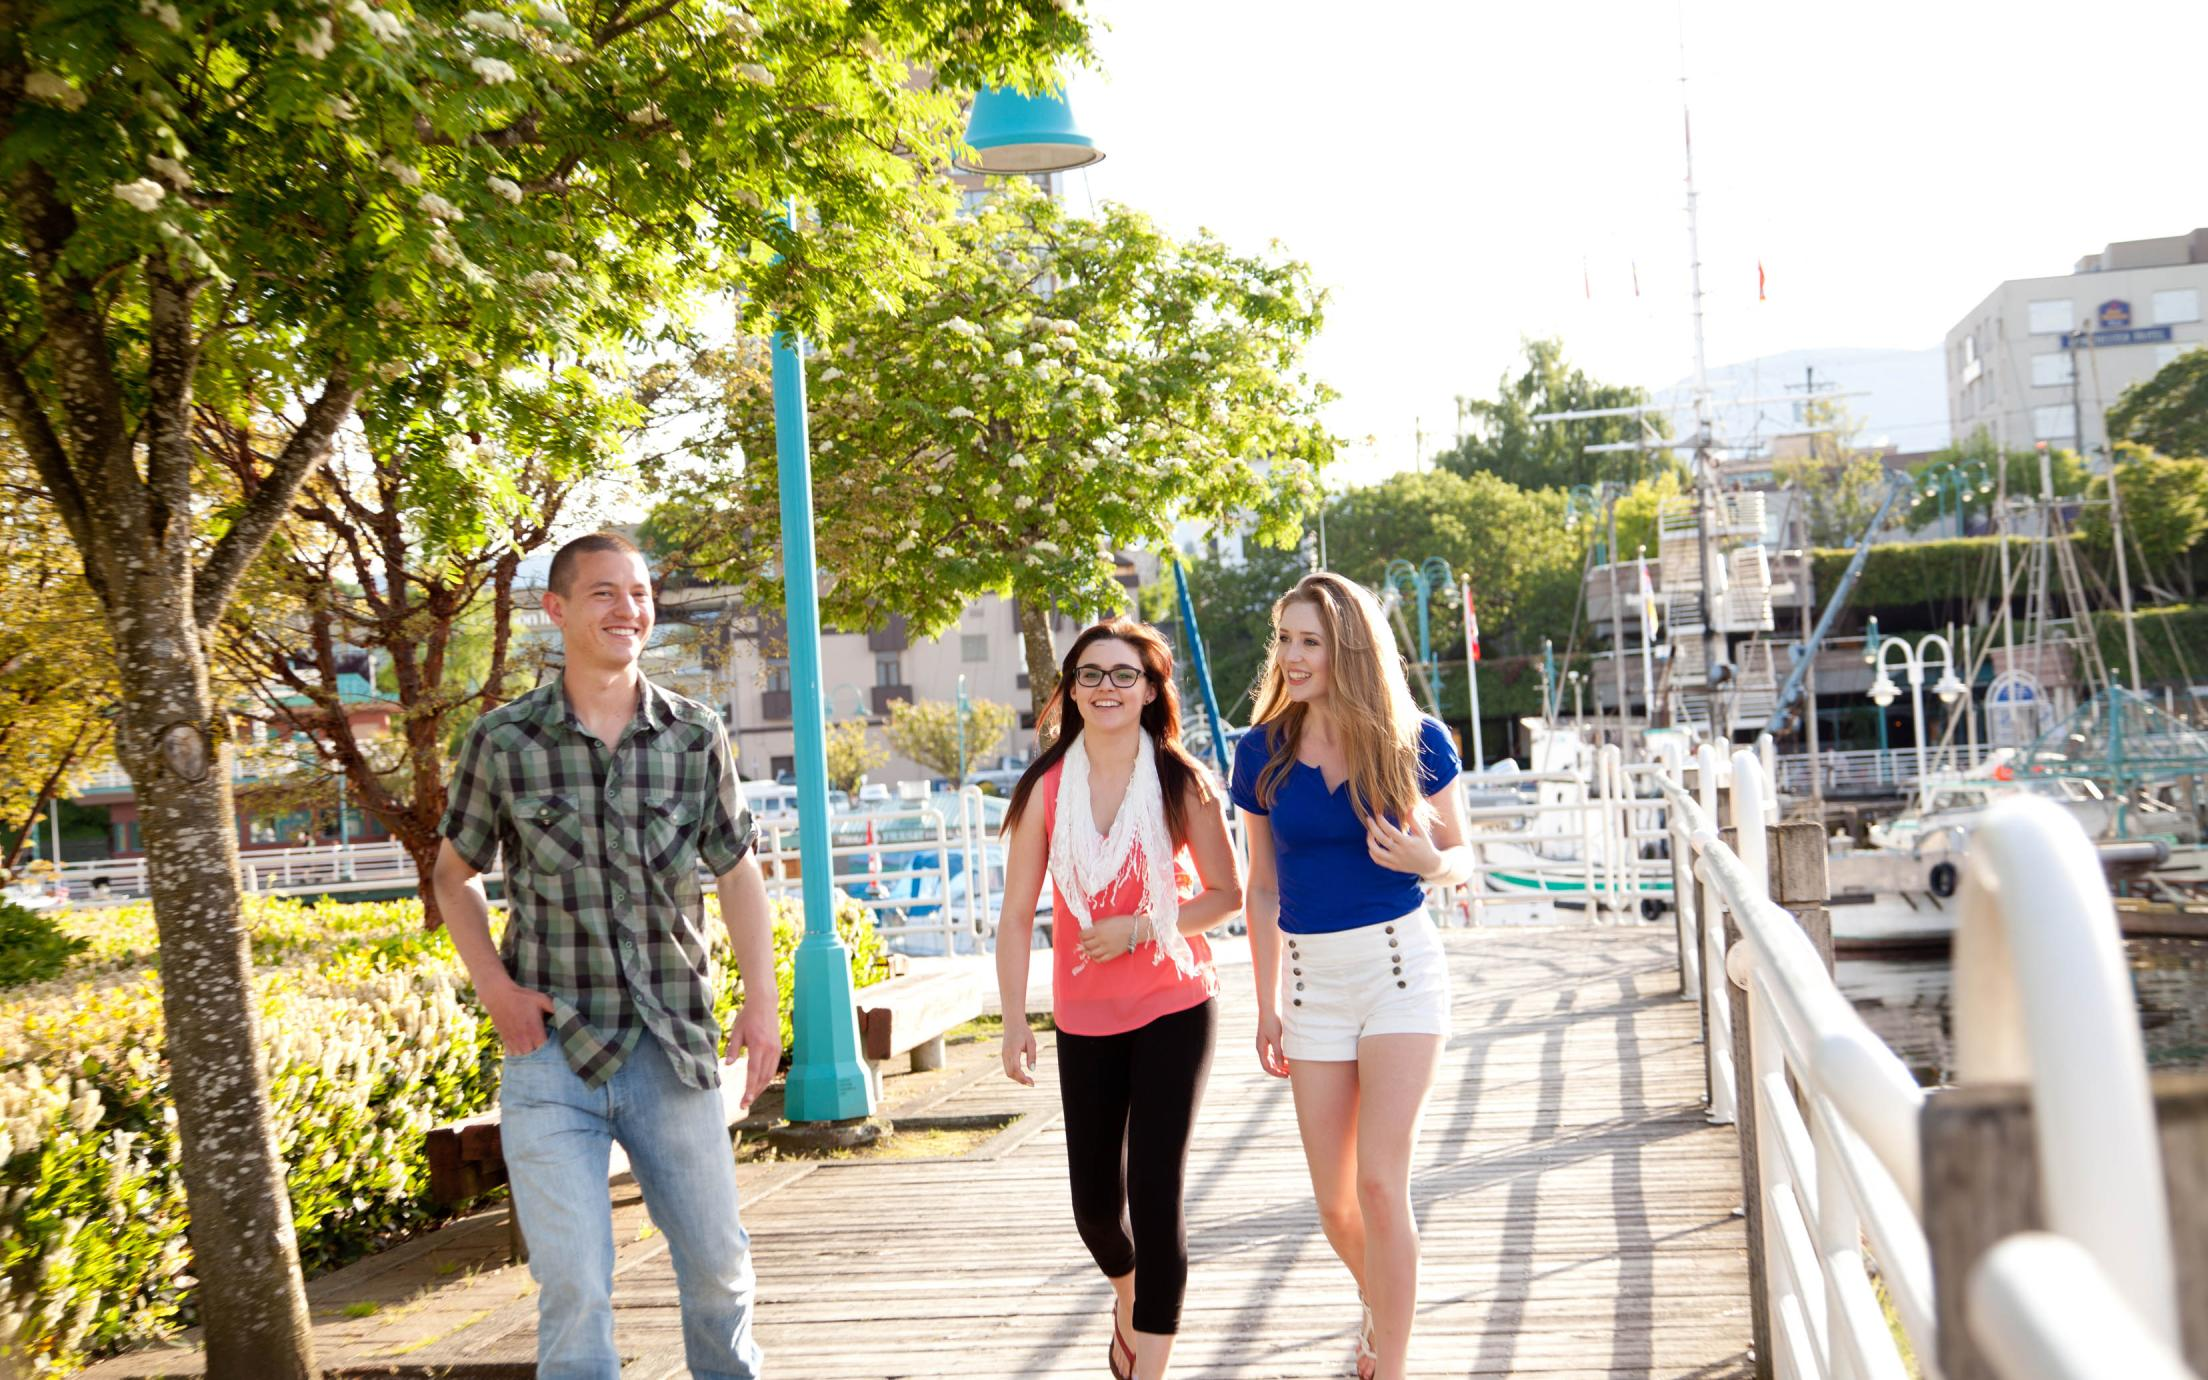 Students of the Exploratory University Studies (EXPO) program exploring downtown Nanaimo